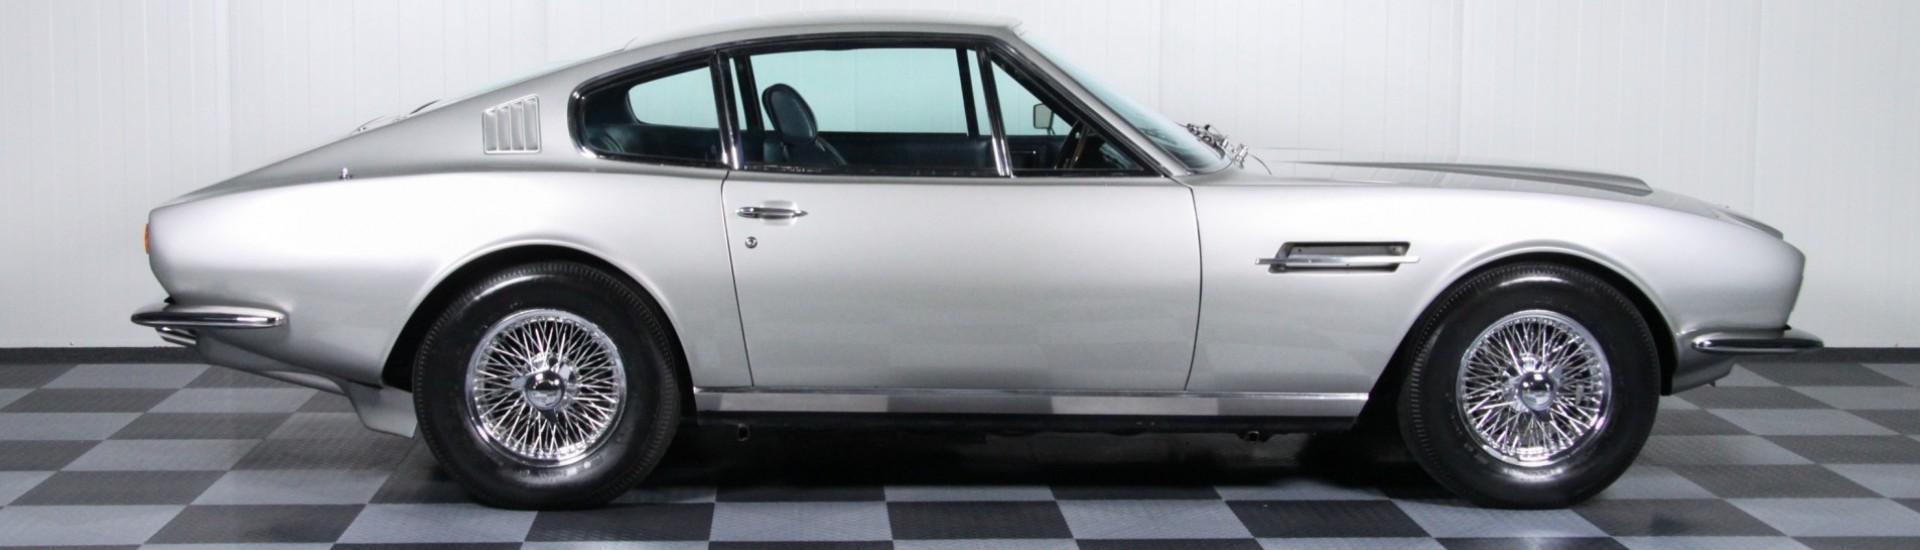 Dream Garage Sold CarsAston Martin Aston Martin DBS V LHD - Aston martin db